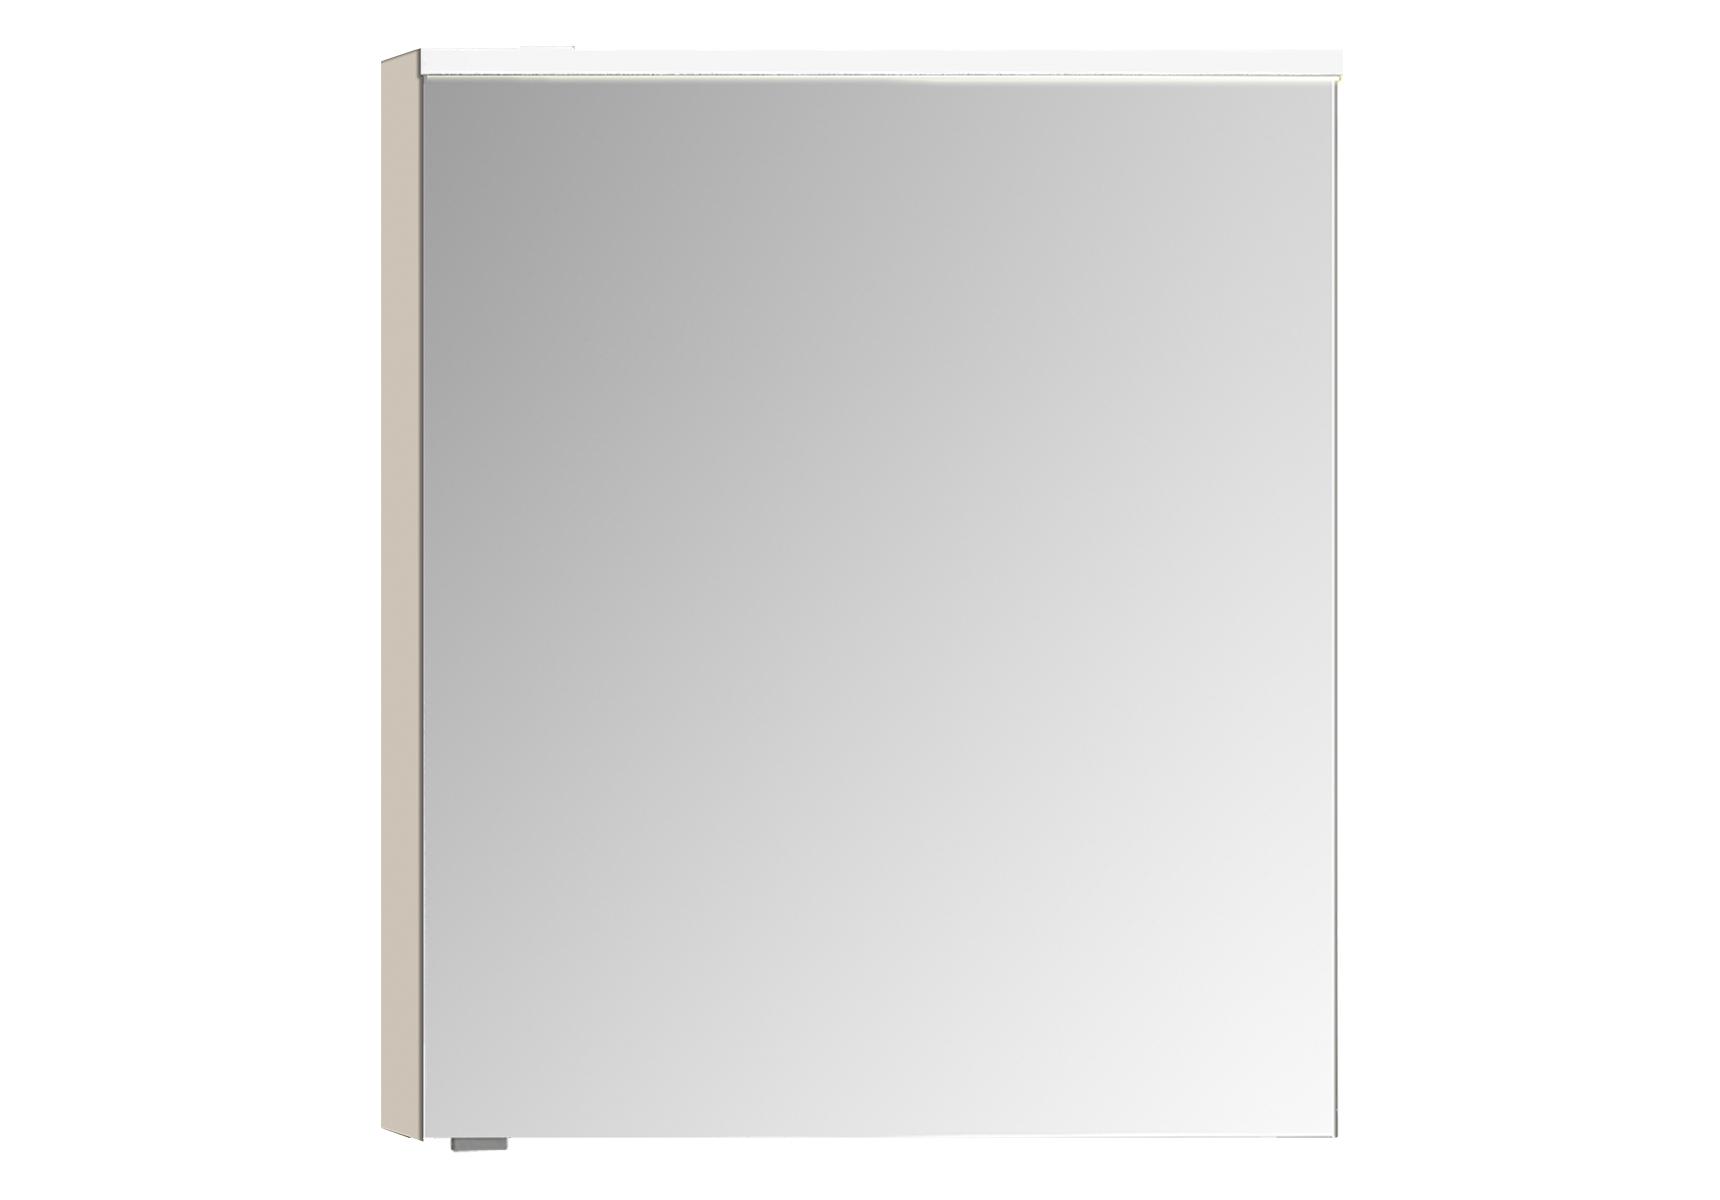 Sento Premium LED-Spiegelschrank, 60 cm, Türanschlag rechts, Crème Matt